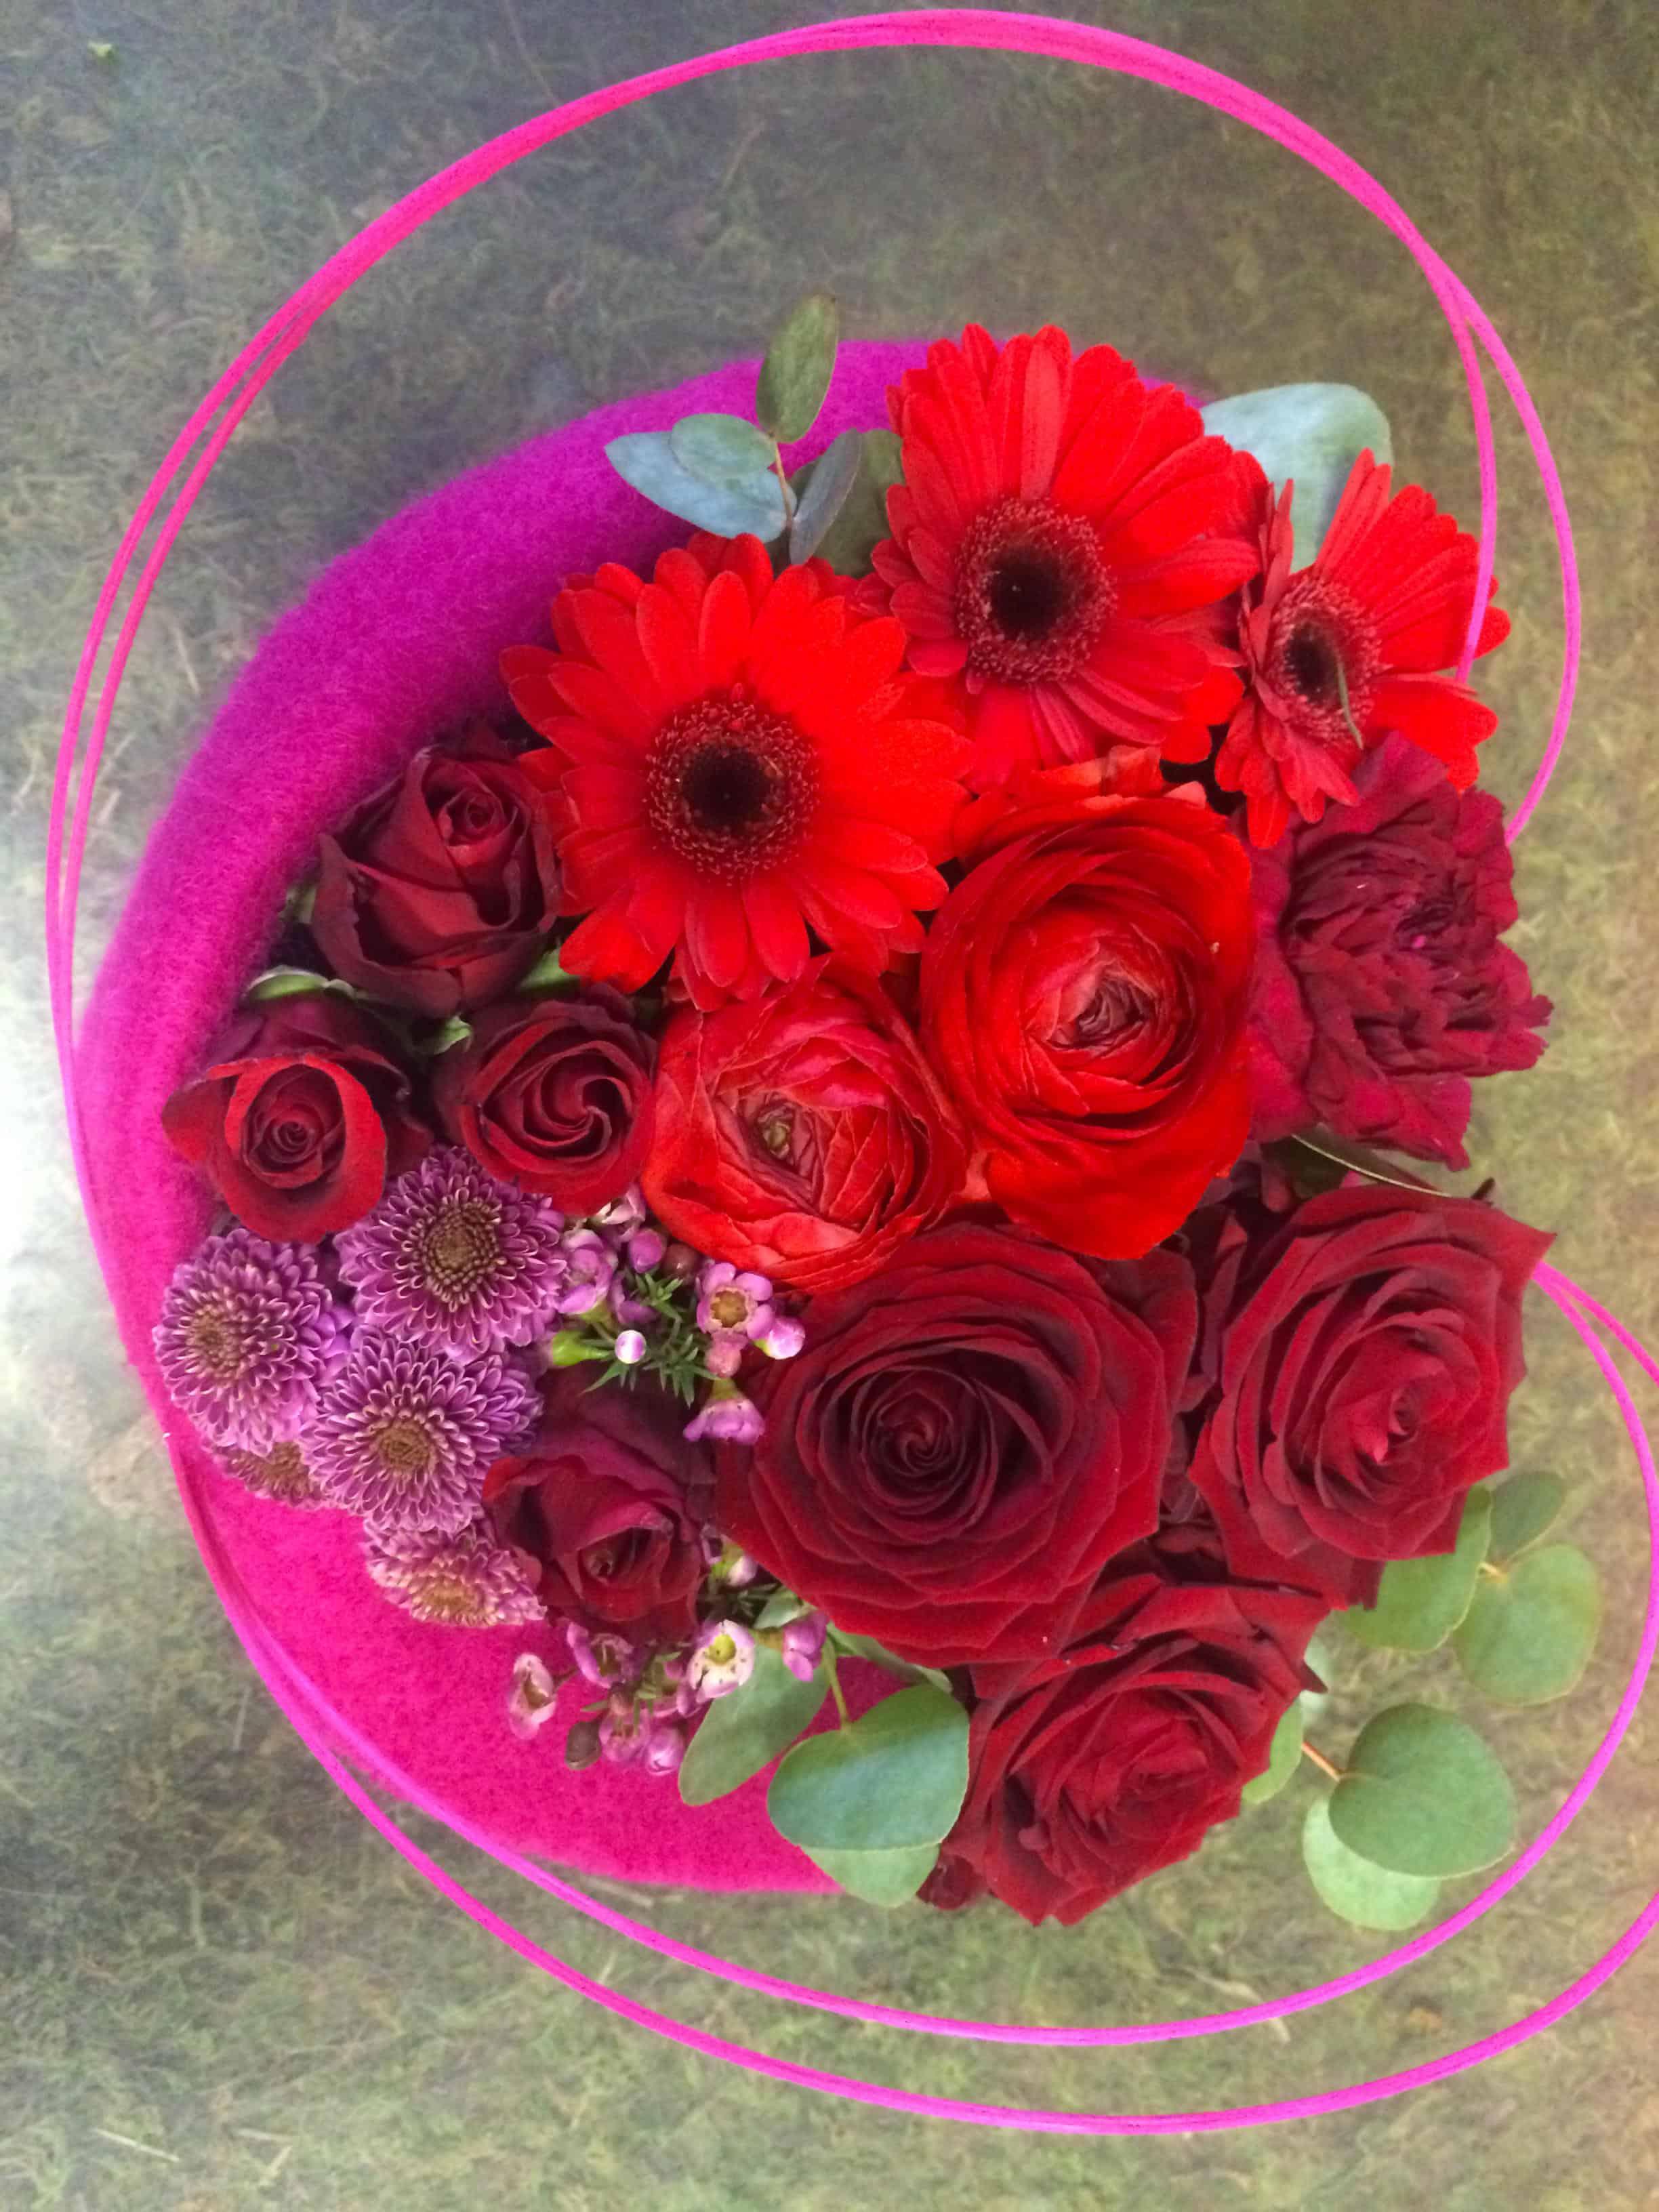 IMG 6796 - Saint Valentin